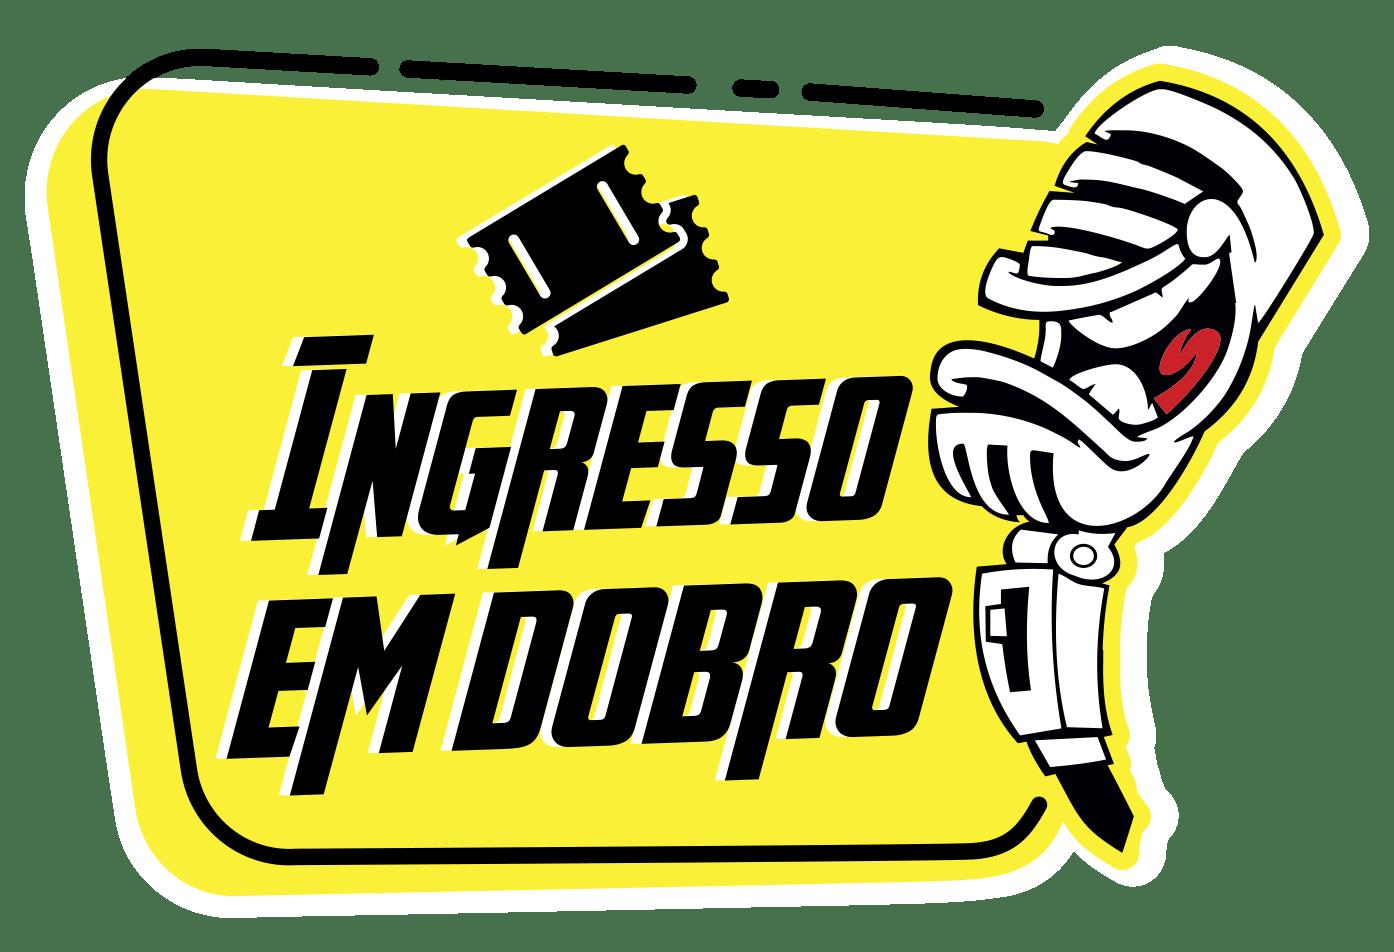 Selo_Ingresso_em_dobro